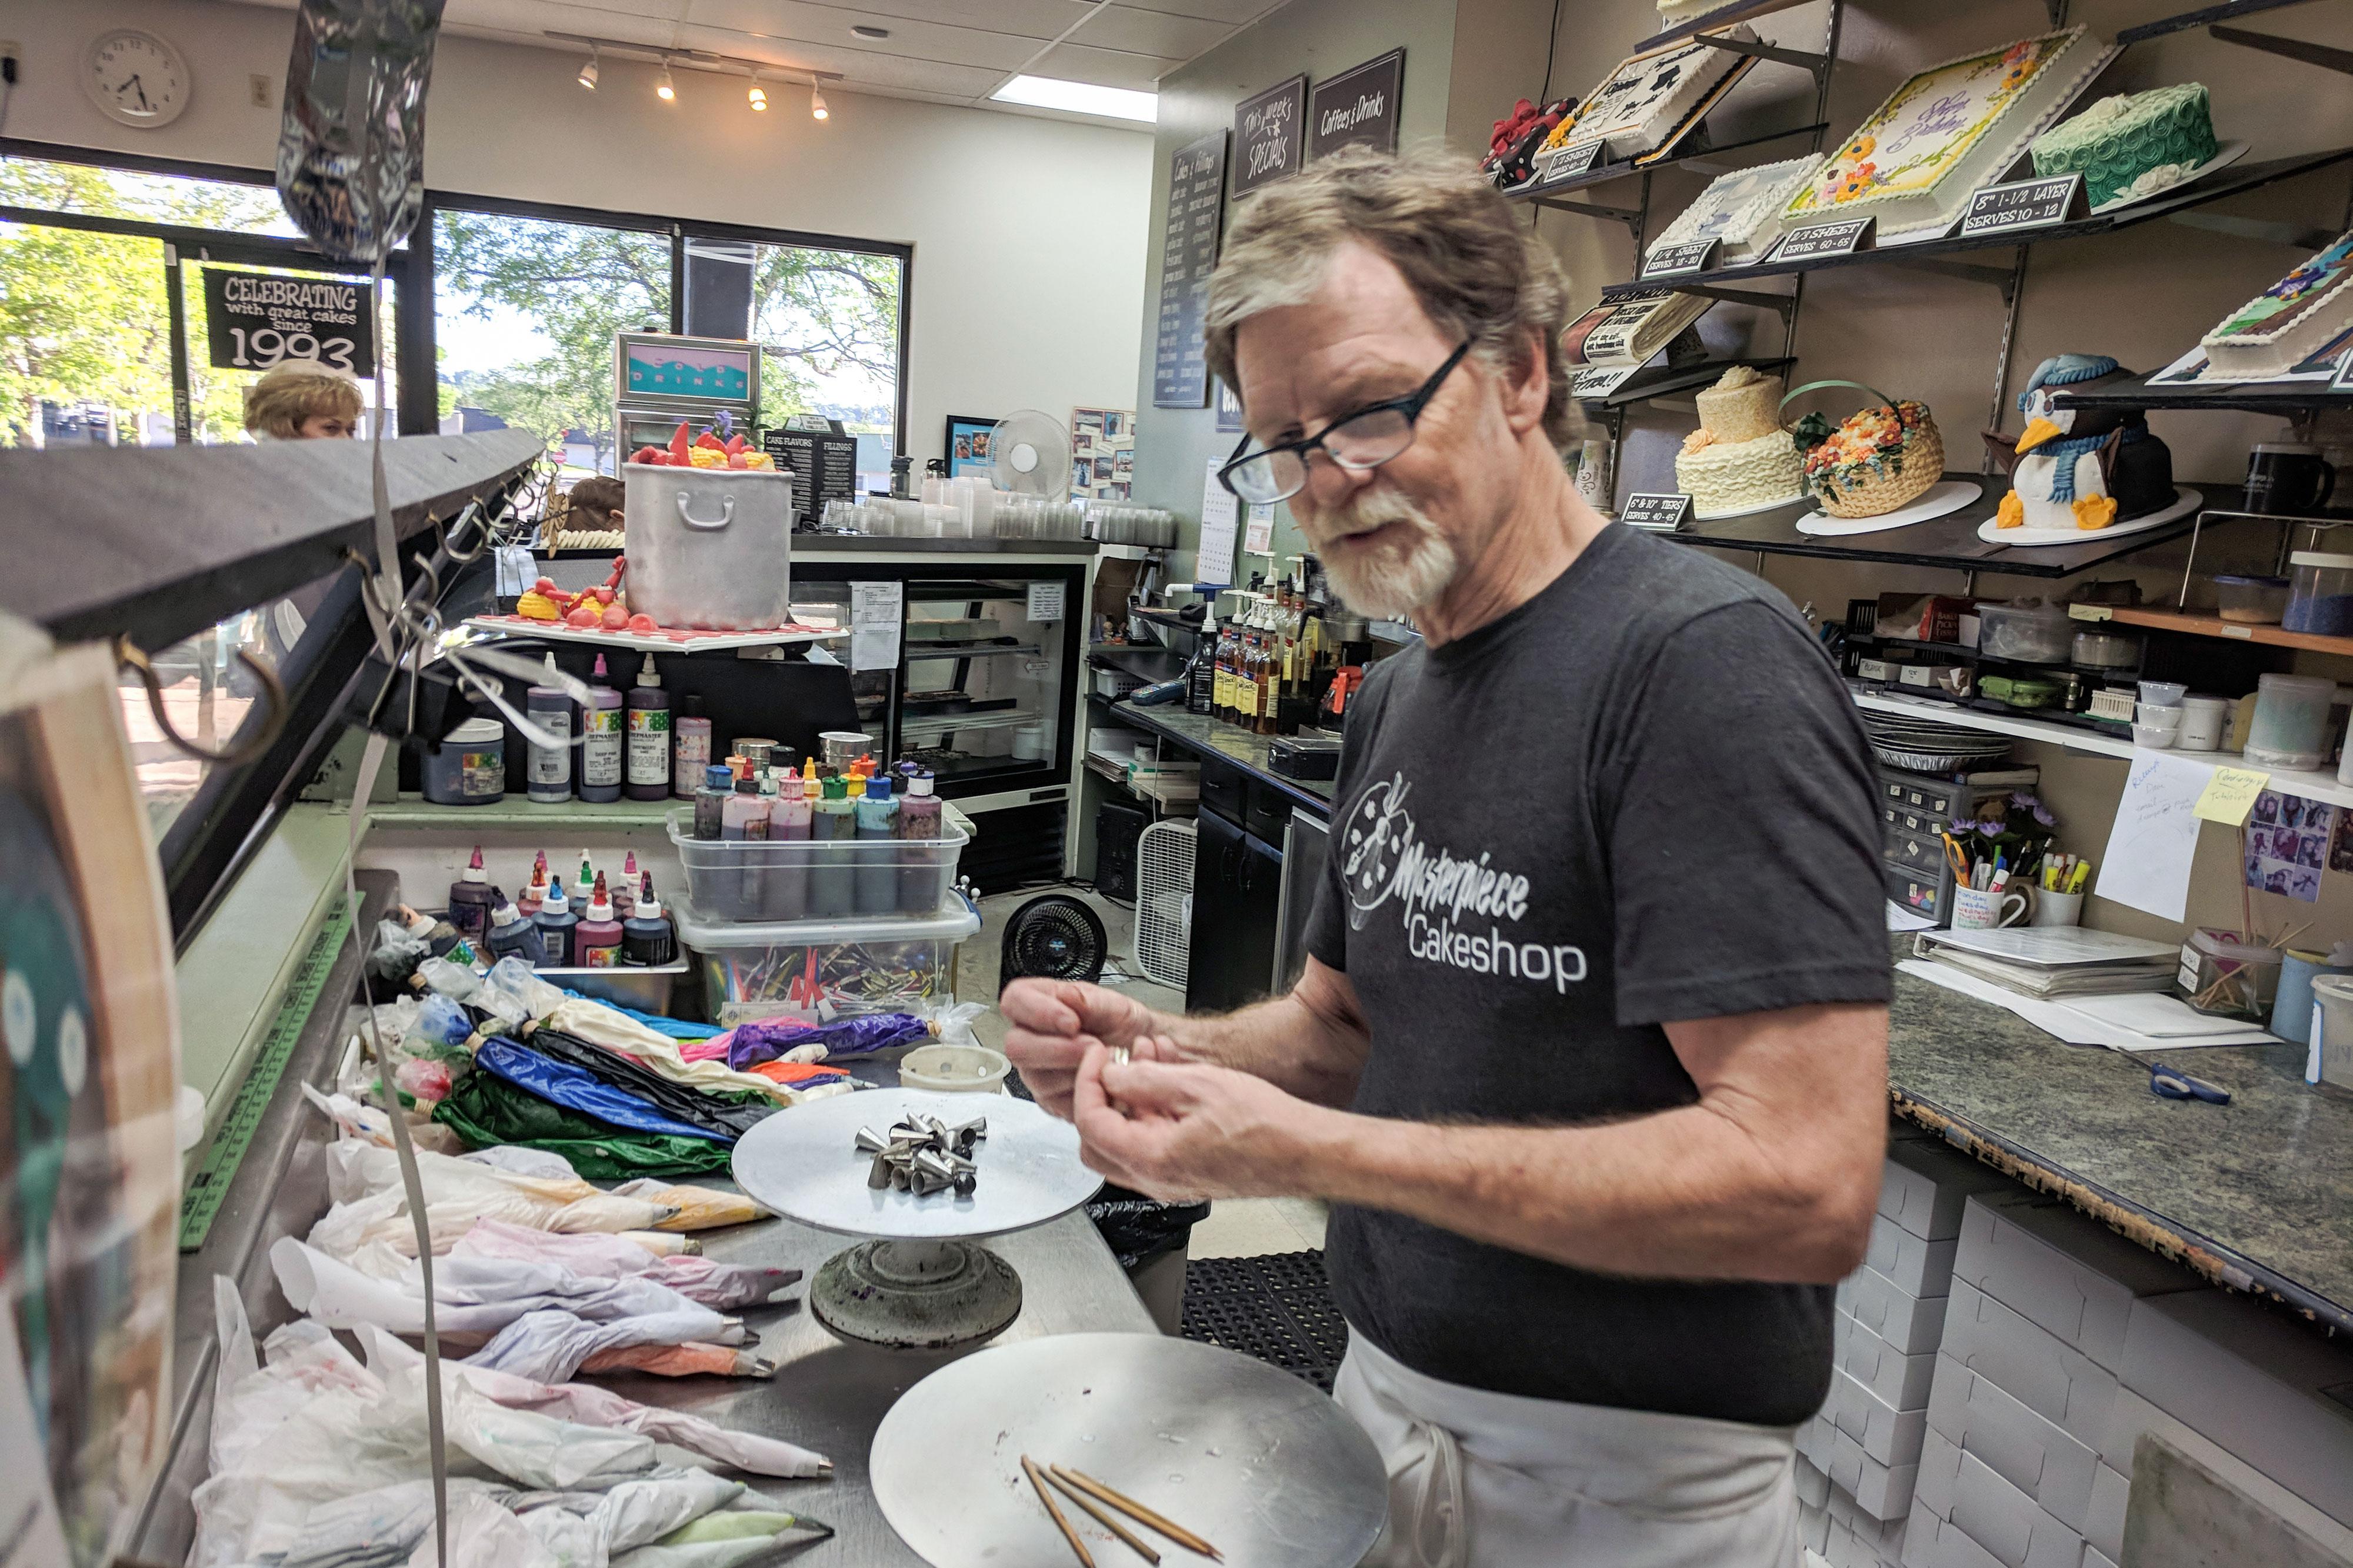 <p>Baker Jack Phillips at work at Masterpiece Cakeshop, June 8, 2018.</p>